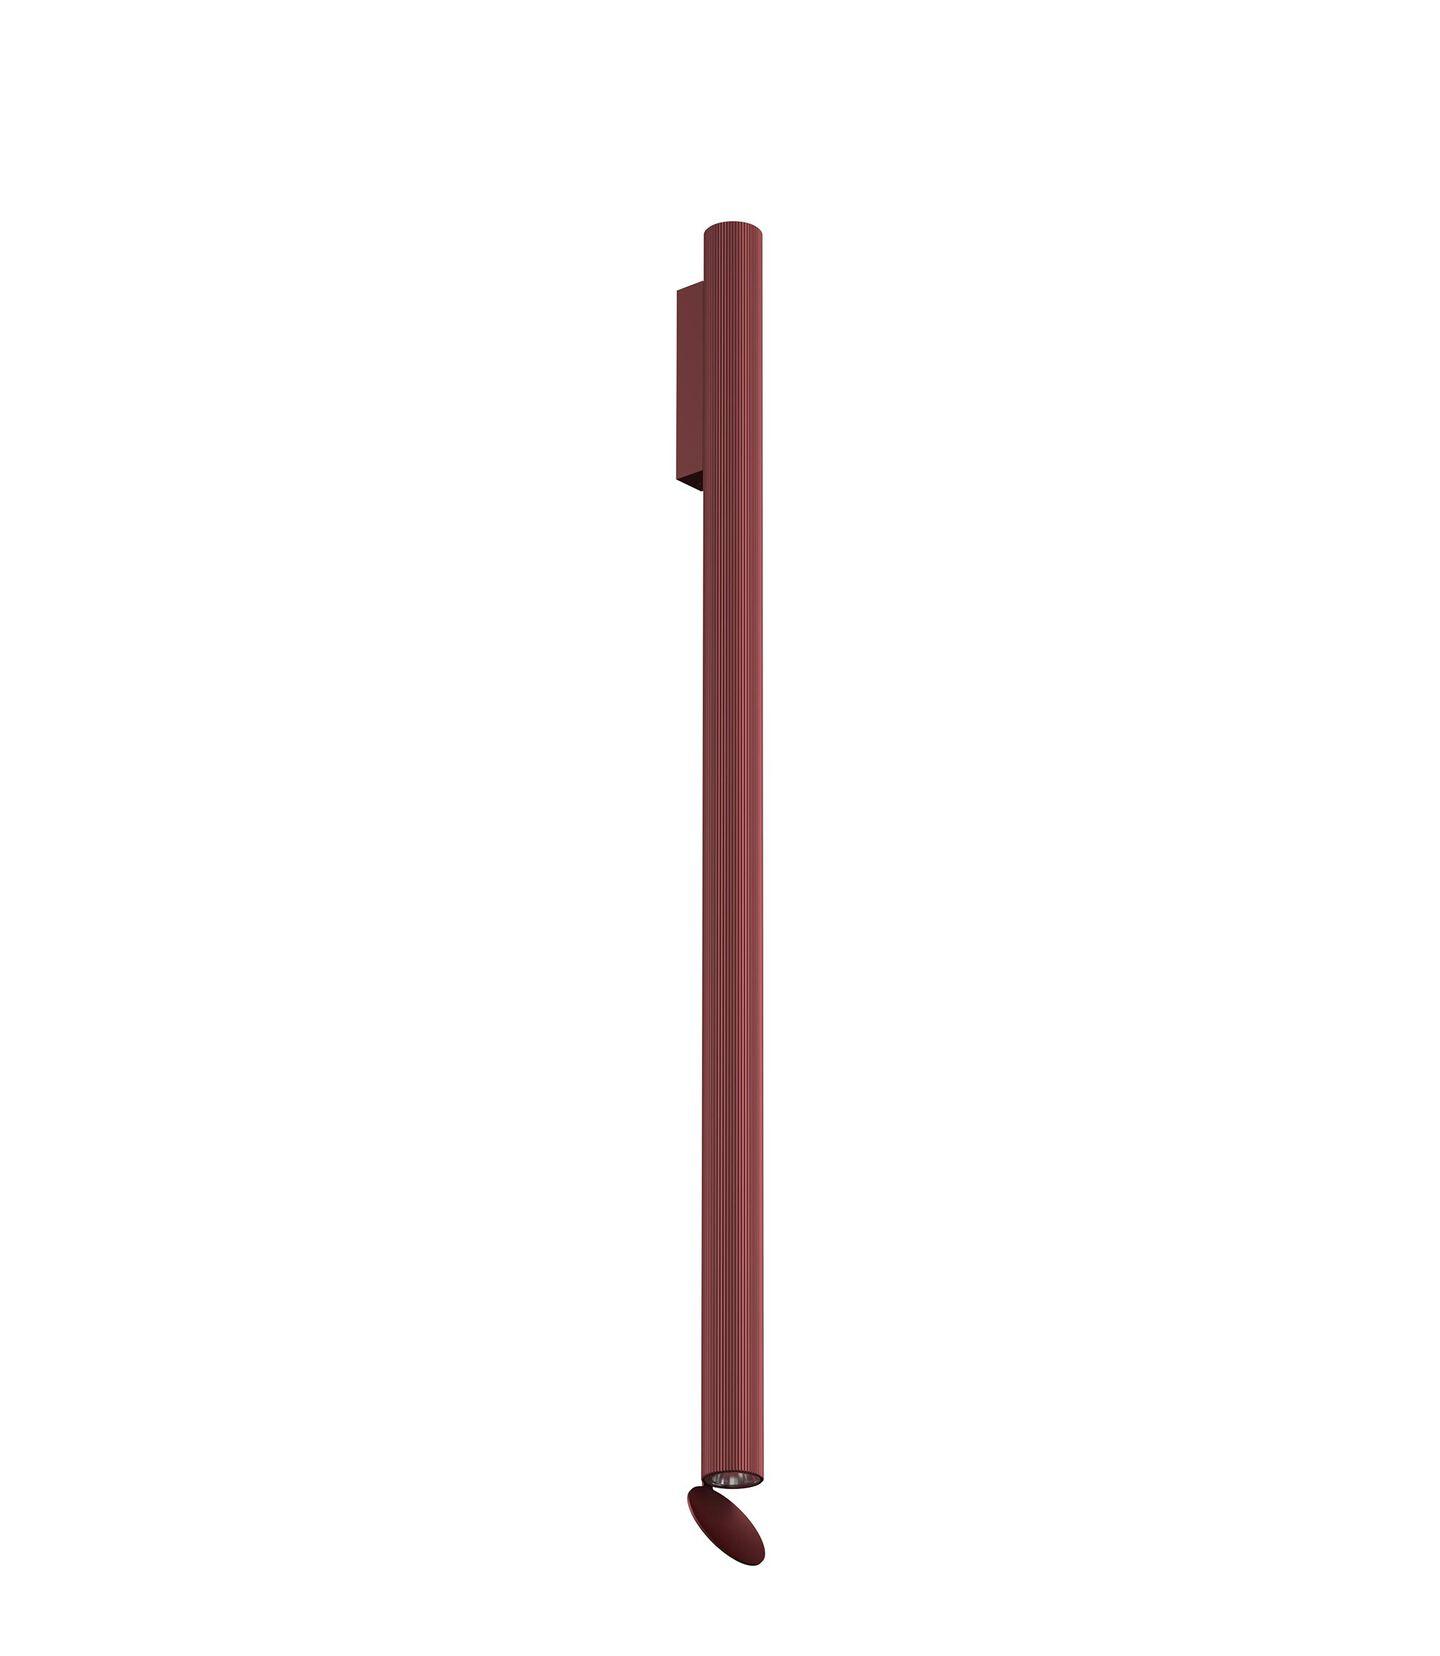 Flauta-ceiling-wall-urquiola-flos-F2344035-product-still-life-big